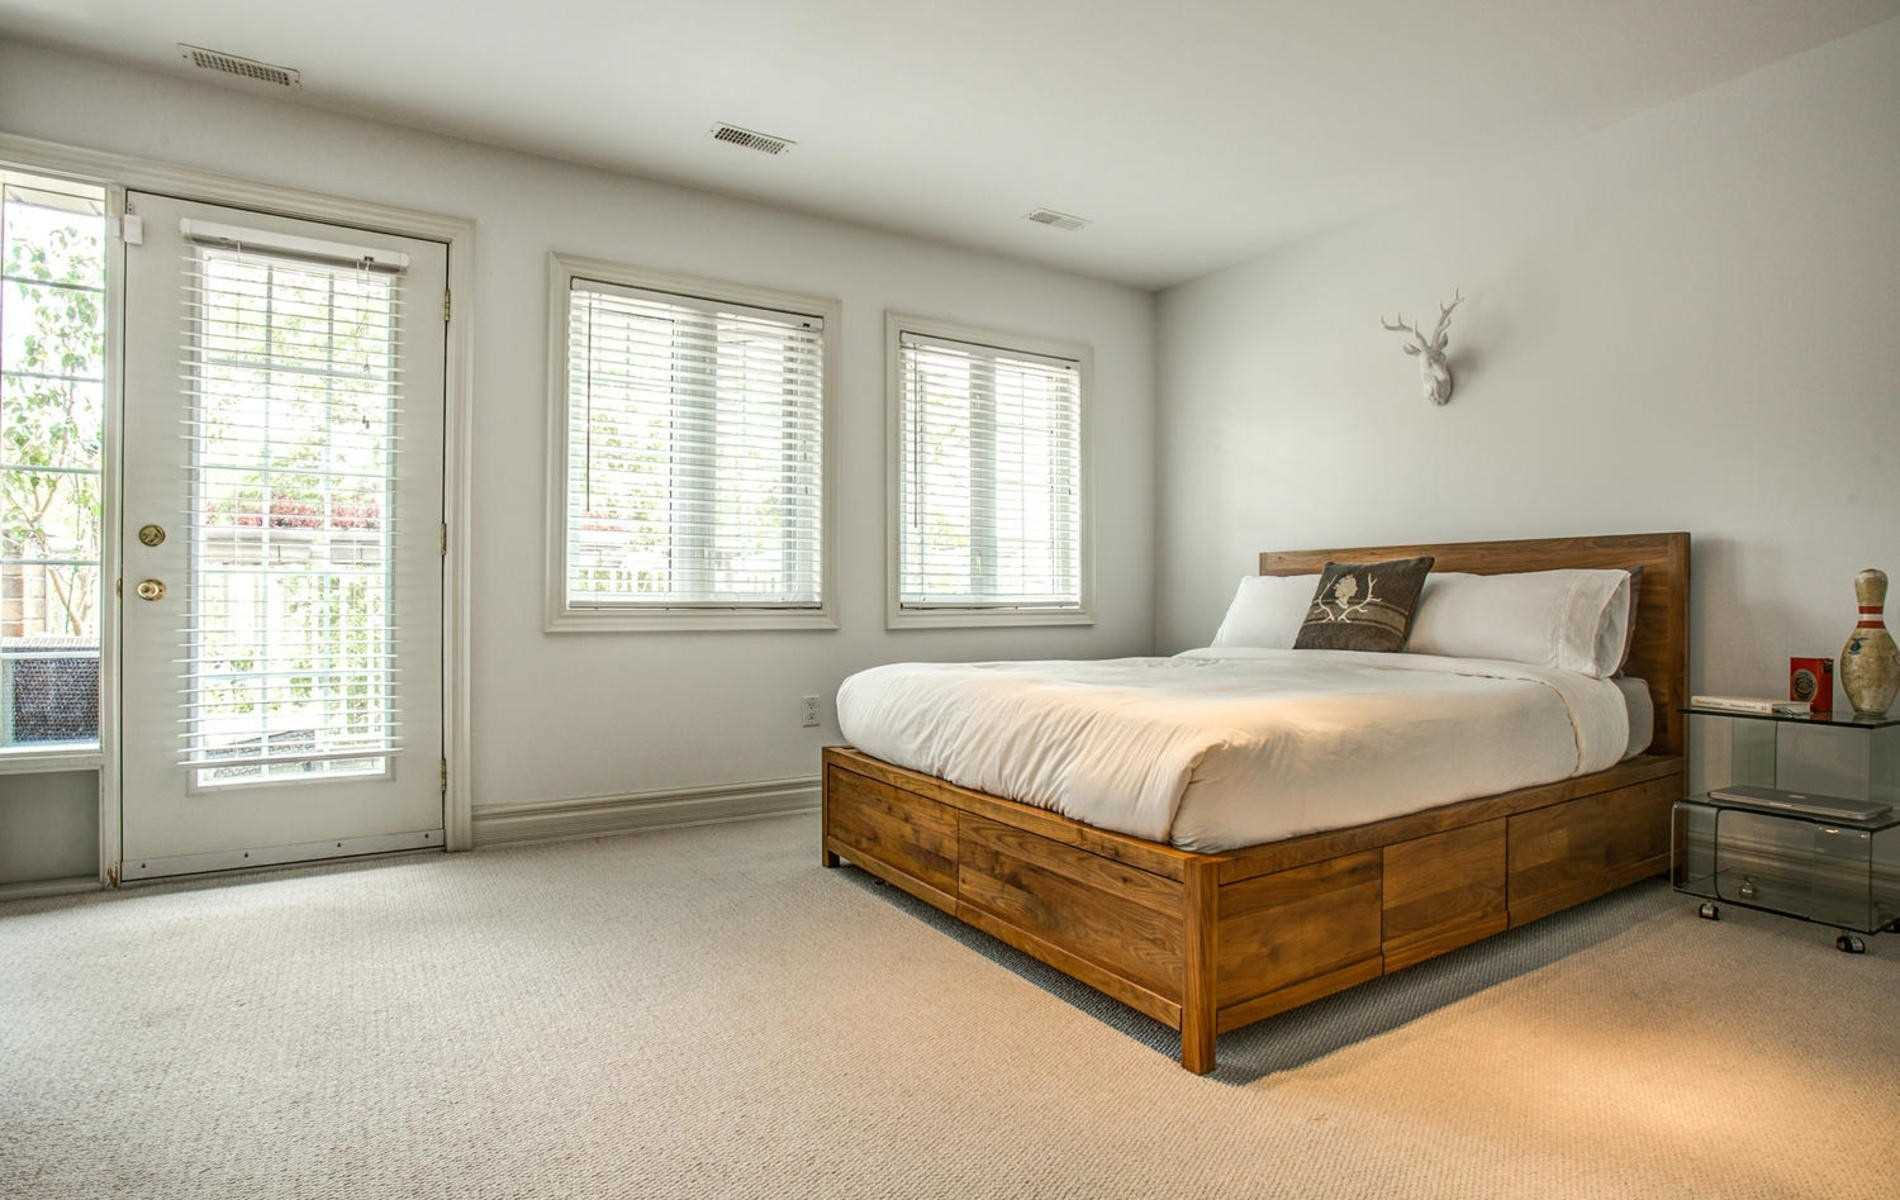 Photo 8: Photos: 119 Carlaw Avenue in Toronto: South Riverdale House (3-Storey) for lease (Toronto E01)  : MLS®# E4386176